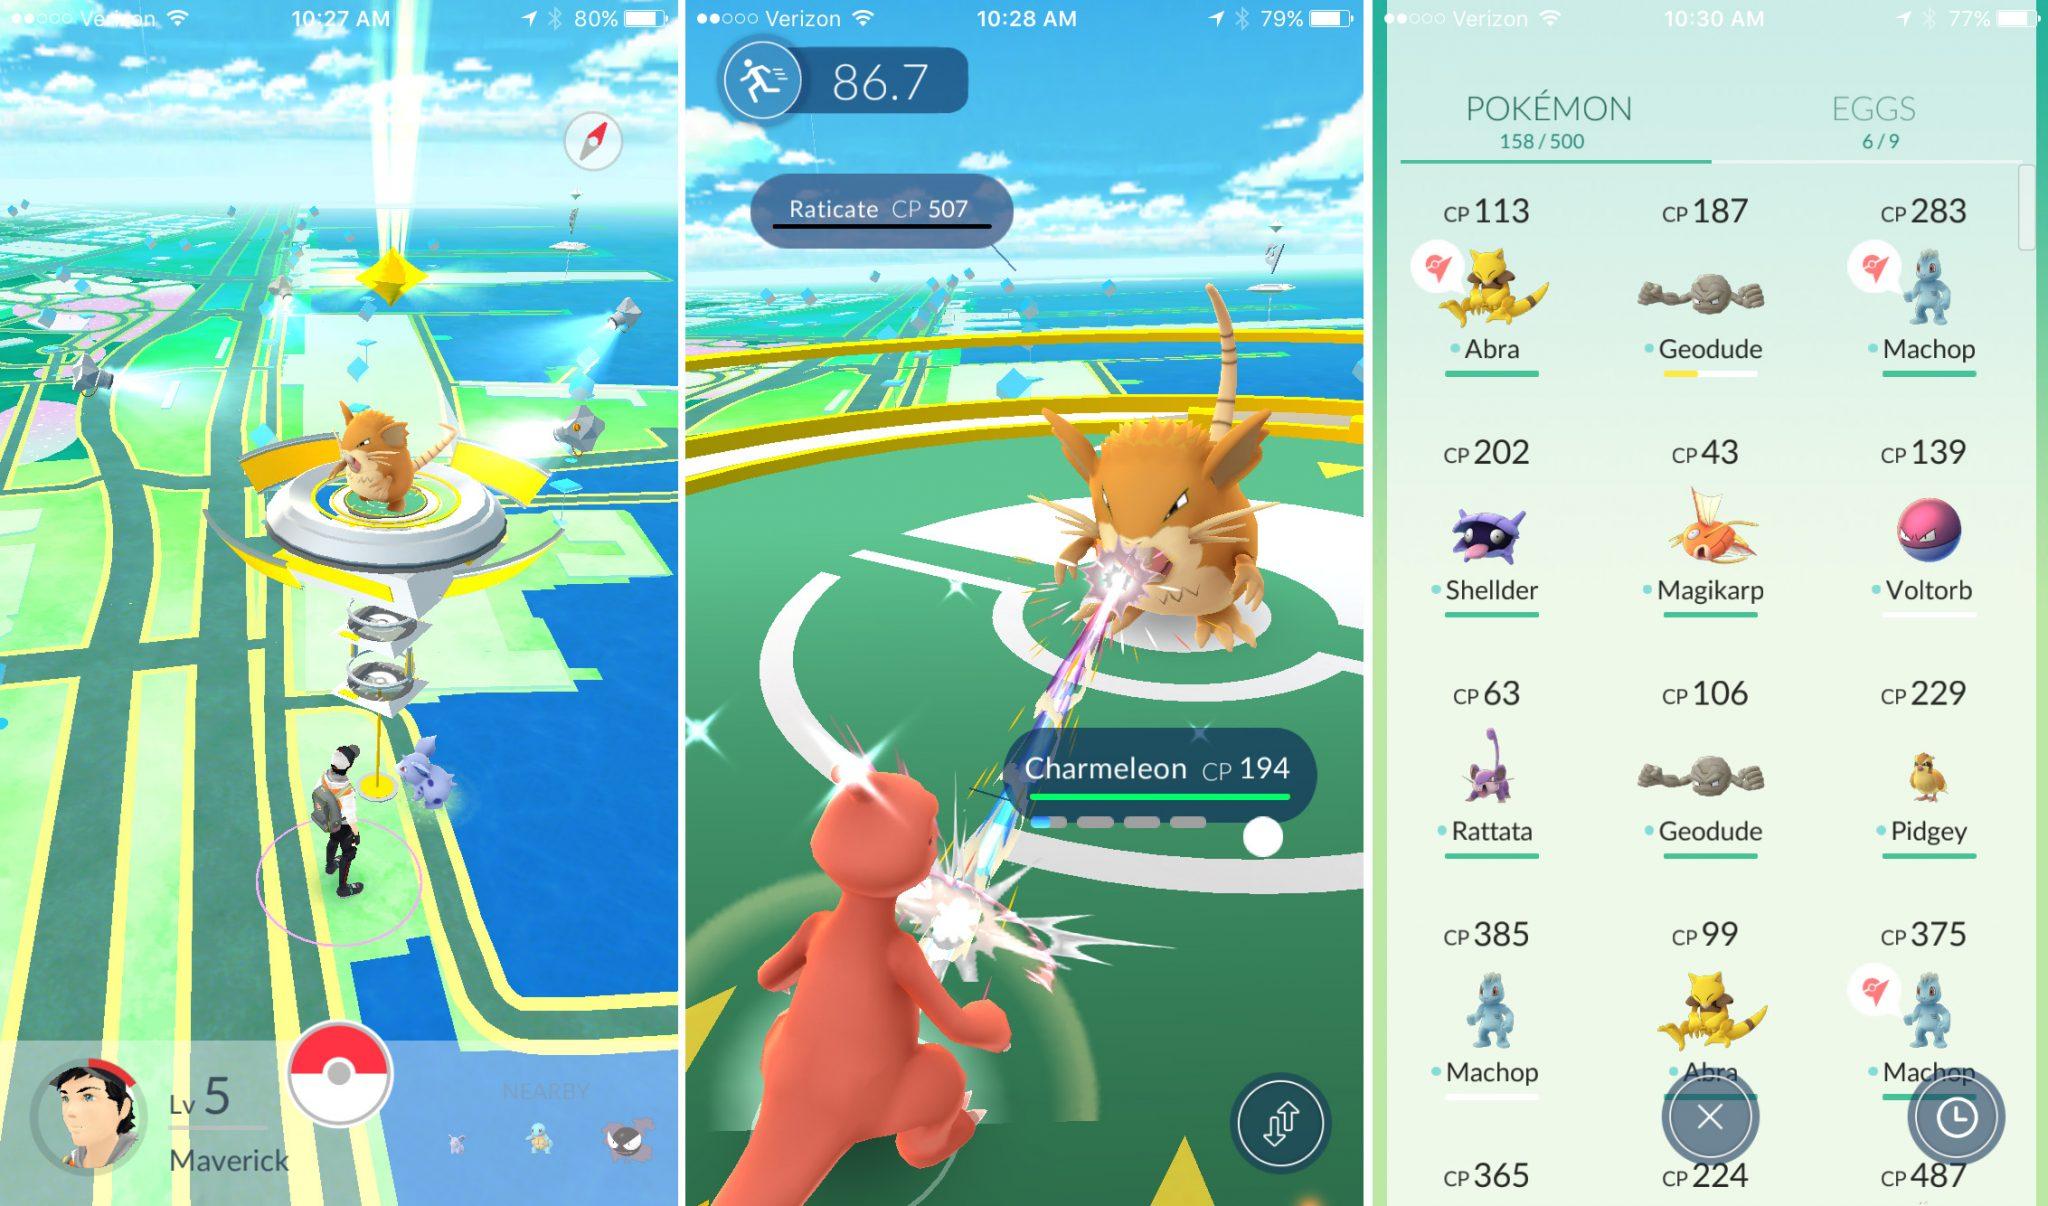 Pokémon Go Screenshot 1